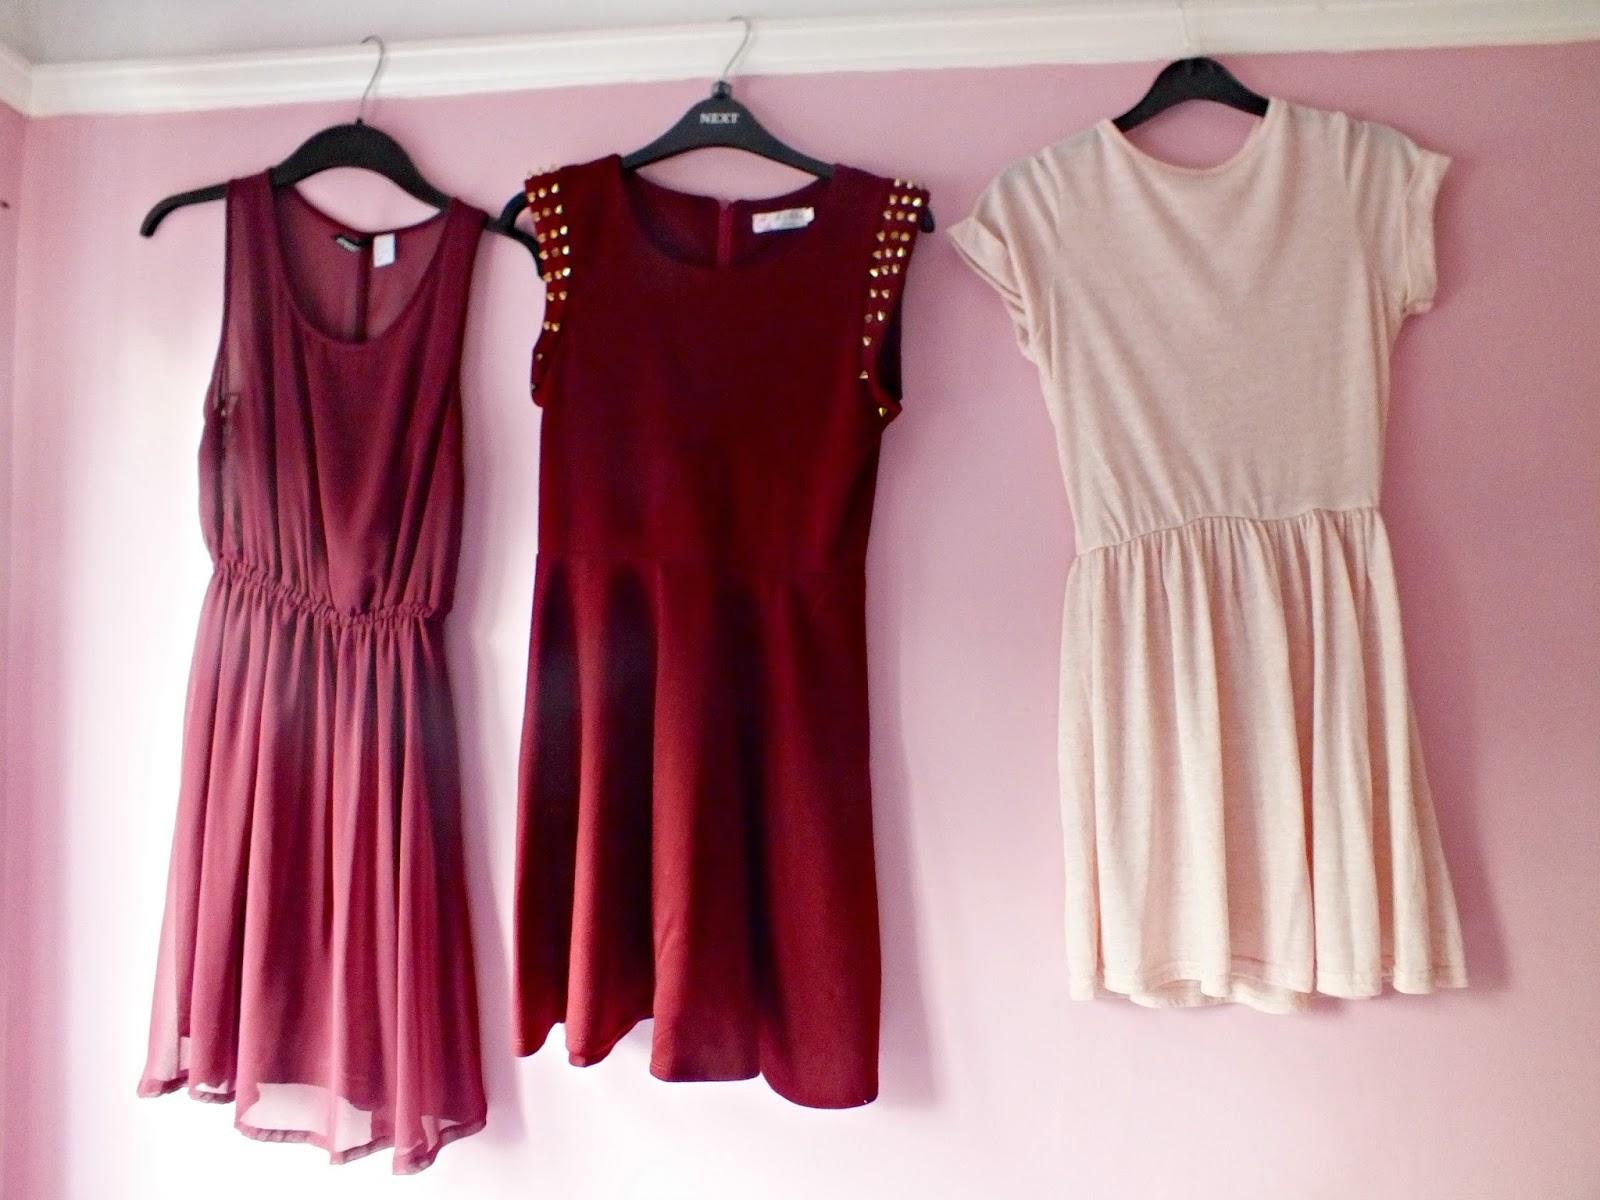 Dlugie sukienki na wesele (9)